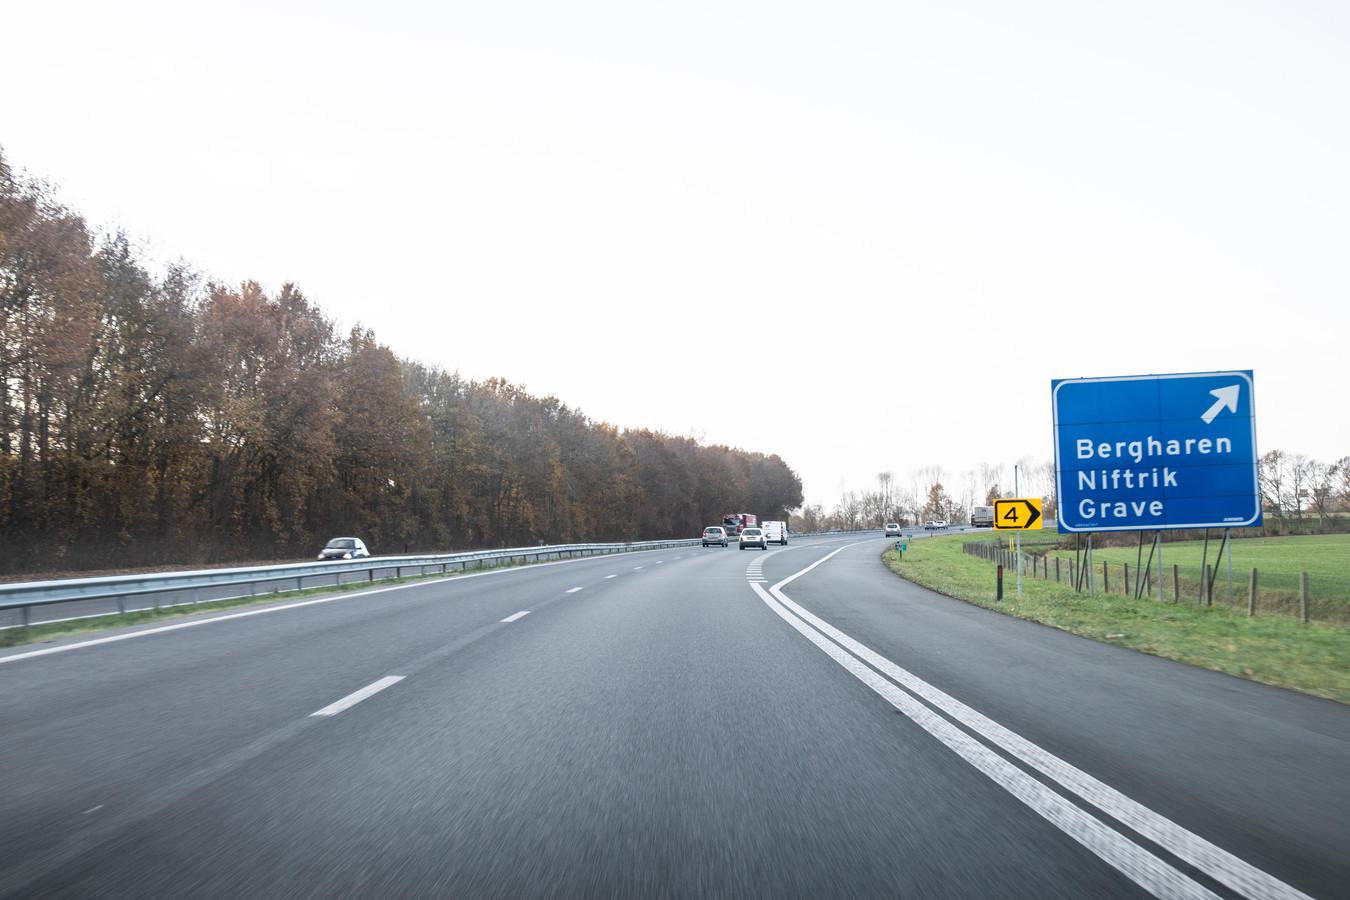 De snelweg A326 in zuidwestelijke richting.